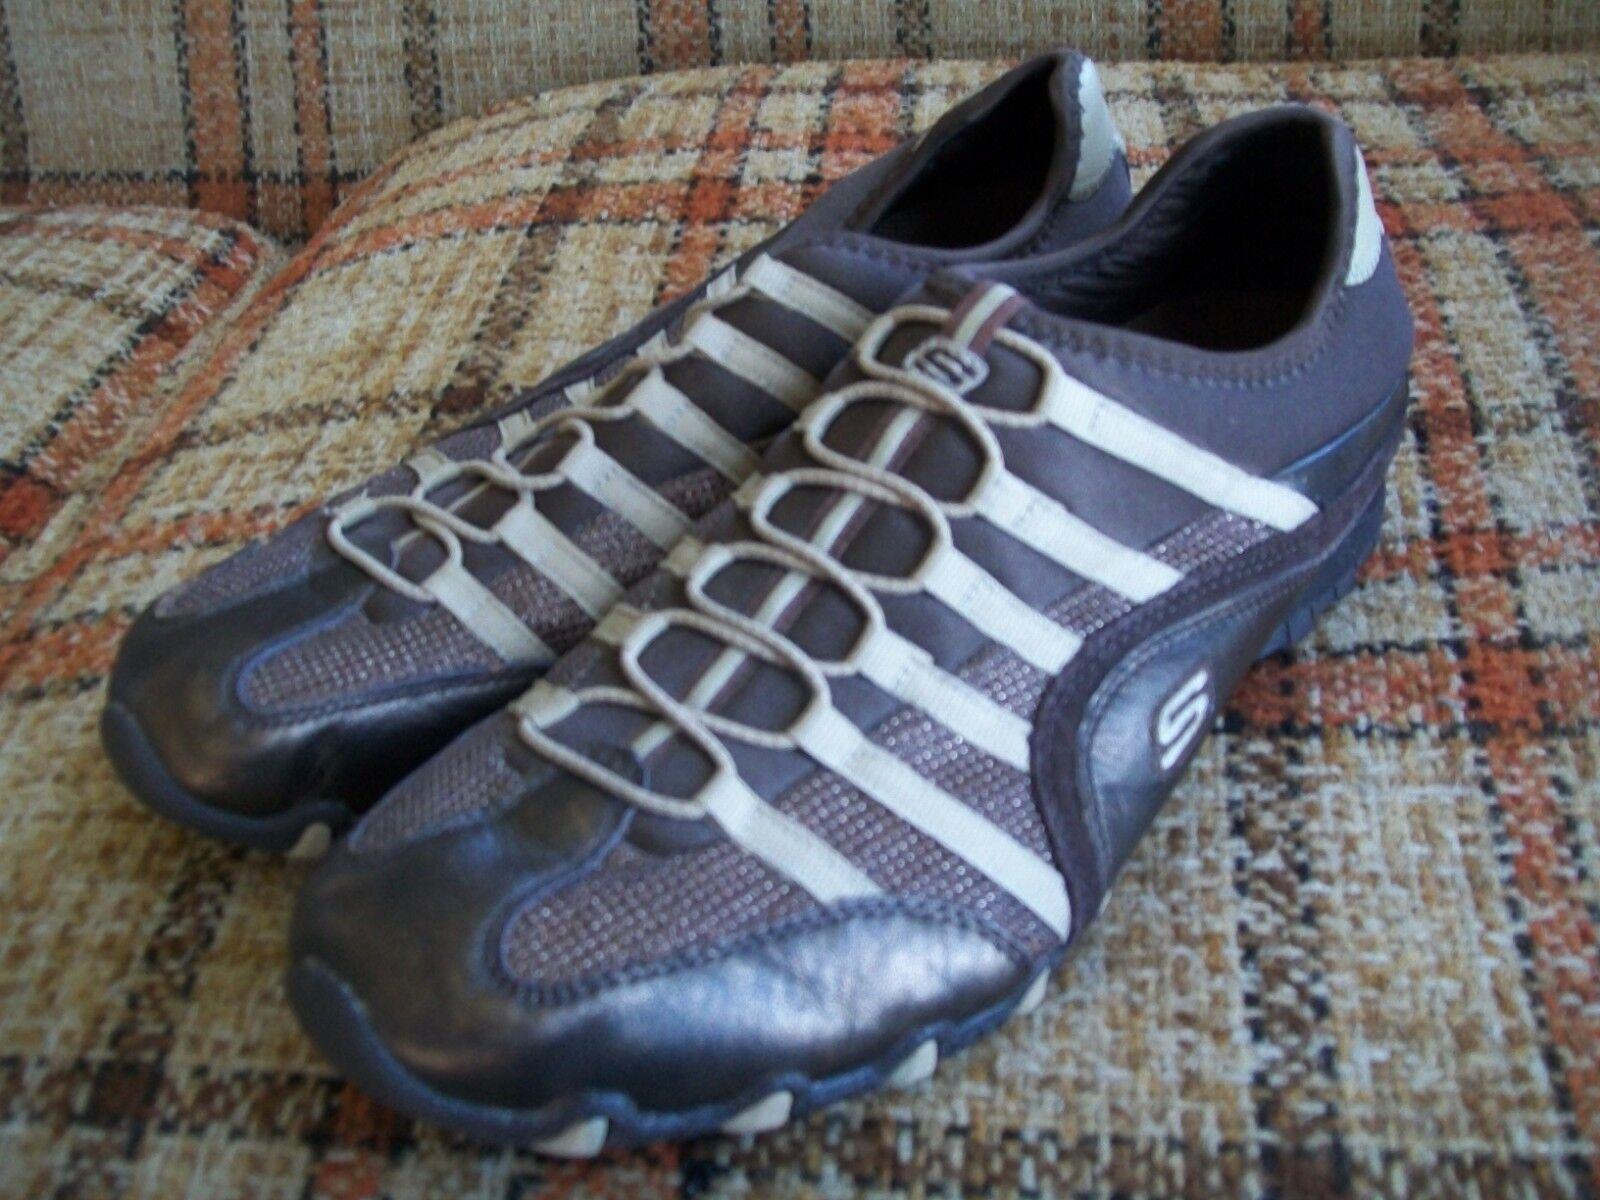 Skechers Womens 11 (41) Bronze Brown Slip On Fashion Sneakers 21483 BRZ